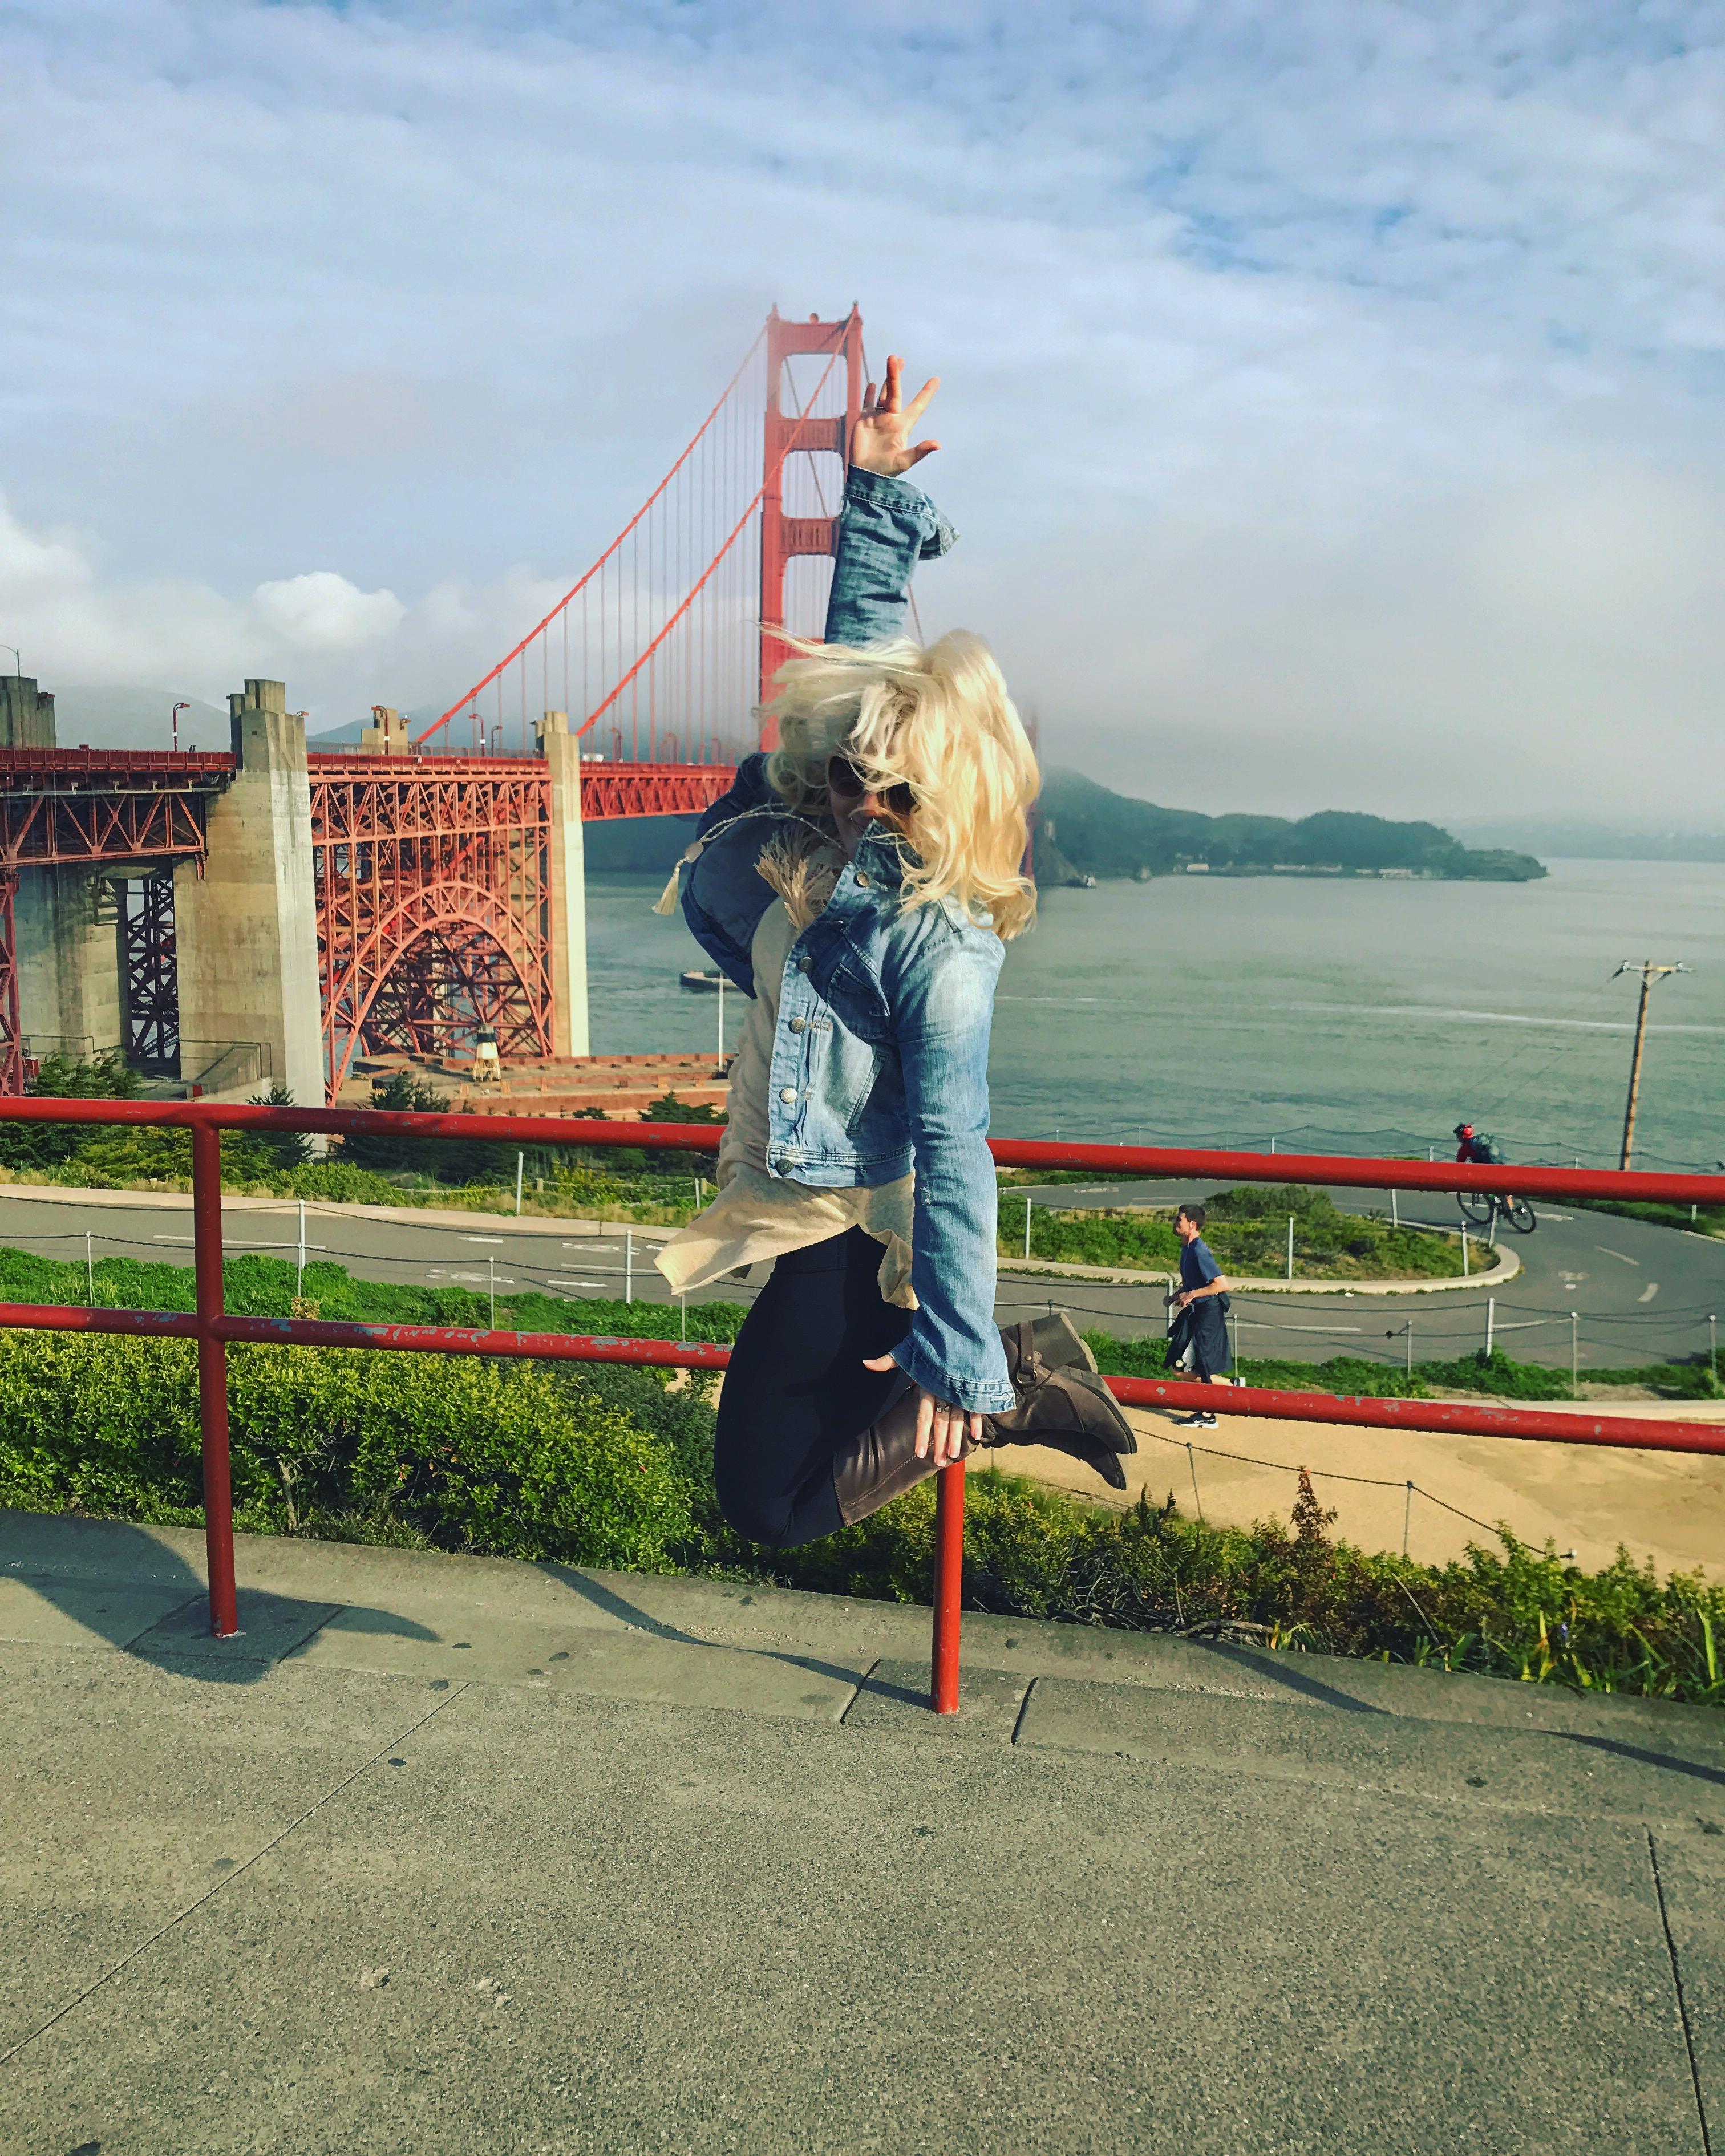 The Wonderment of the Golden Gate Bridge